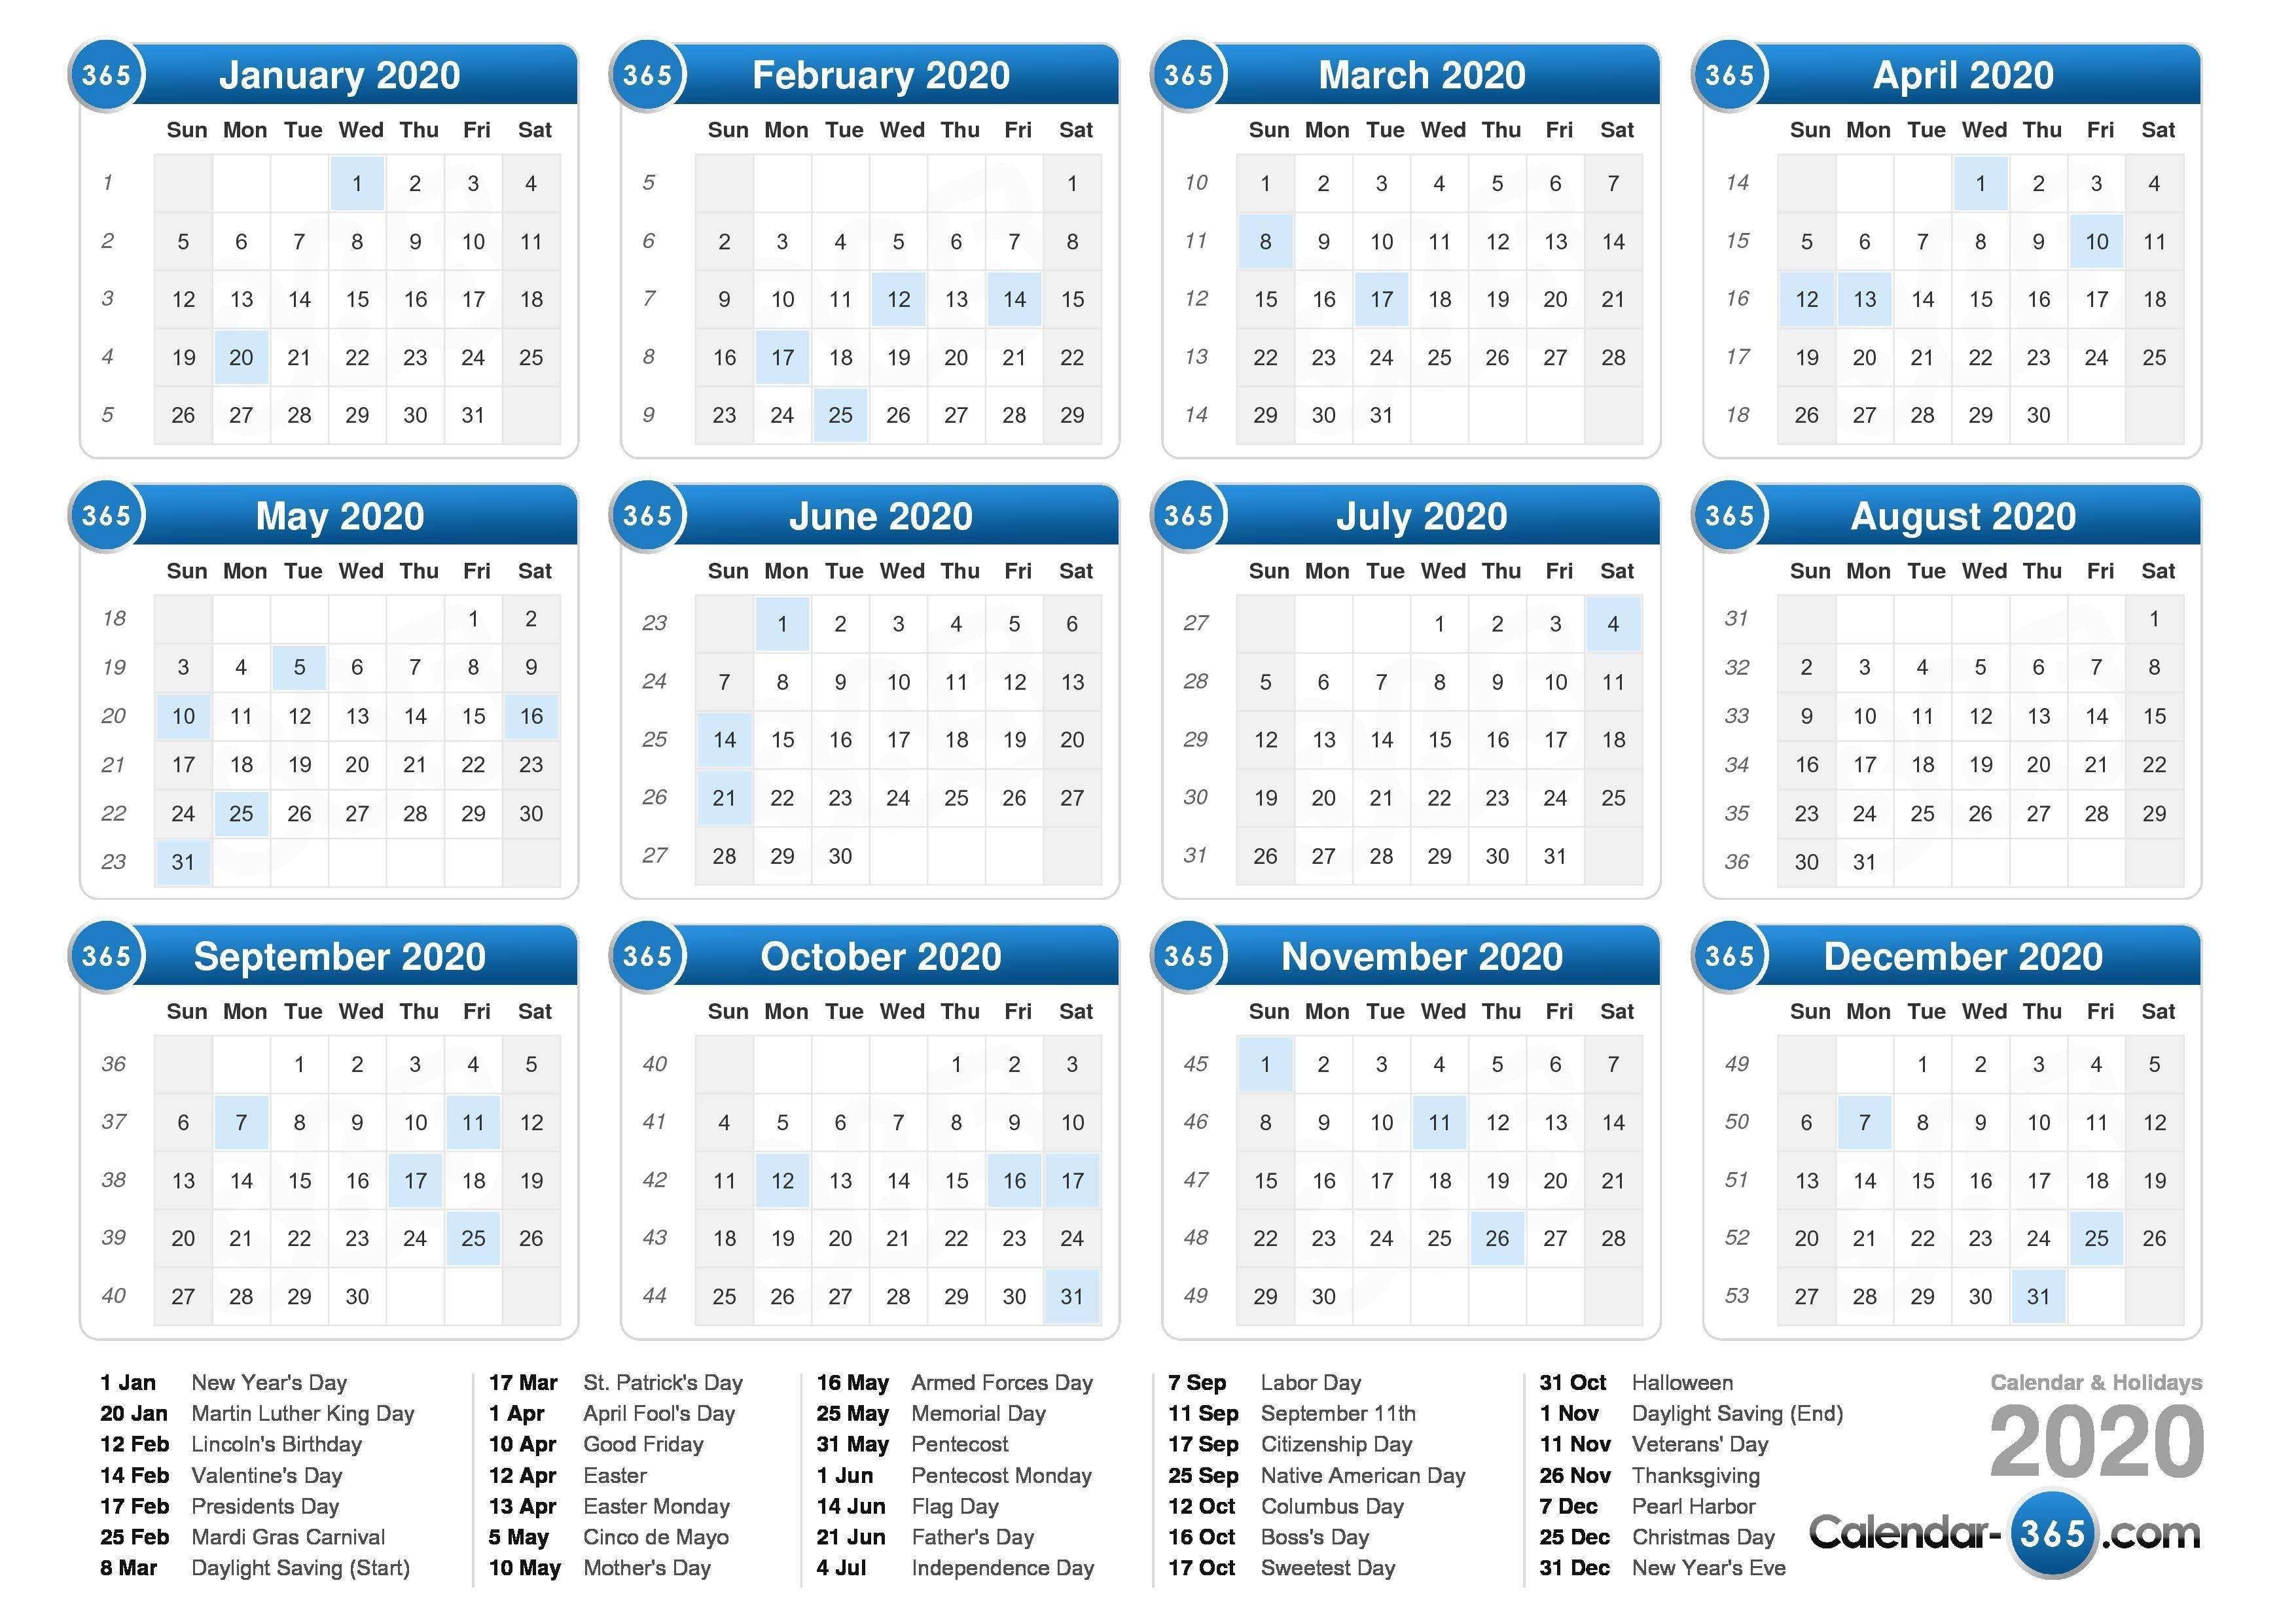 2020 Calendar-Sa 2020 Calendar With Holidays